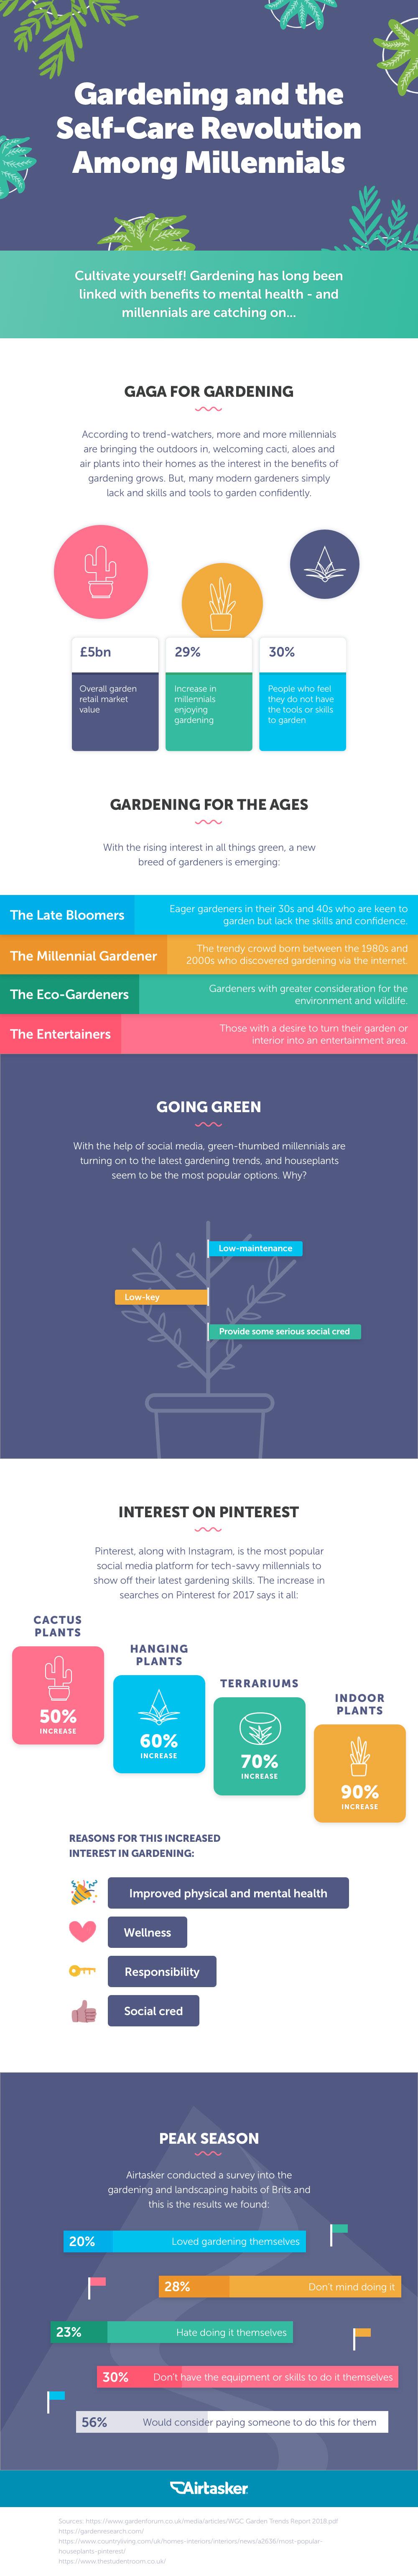 Airtasker Gardening infographic